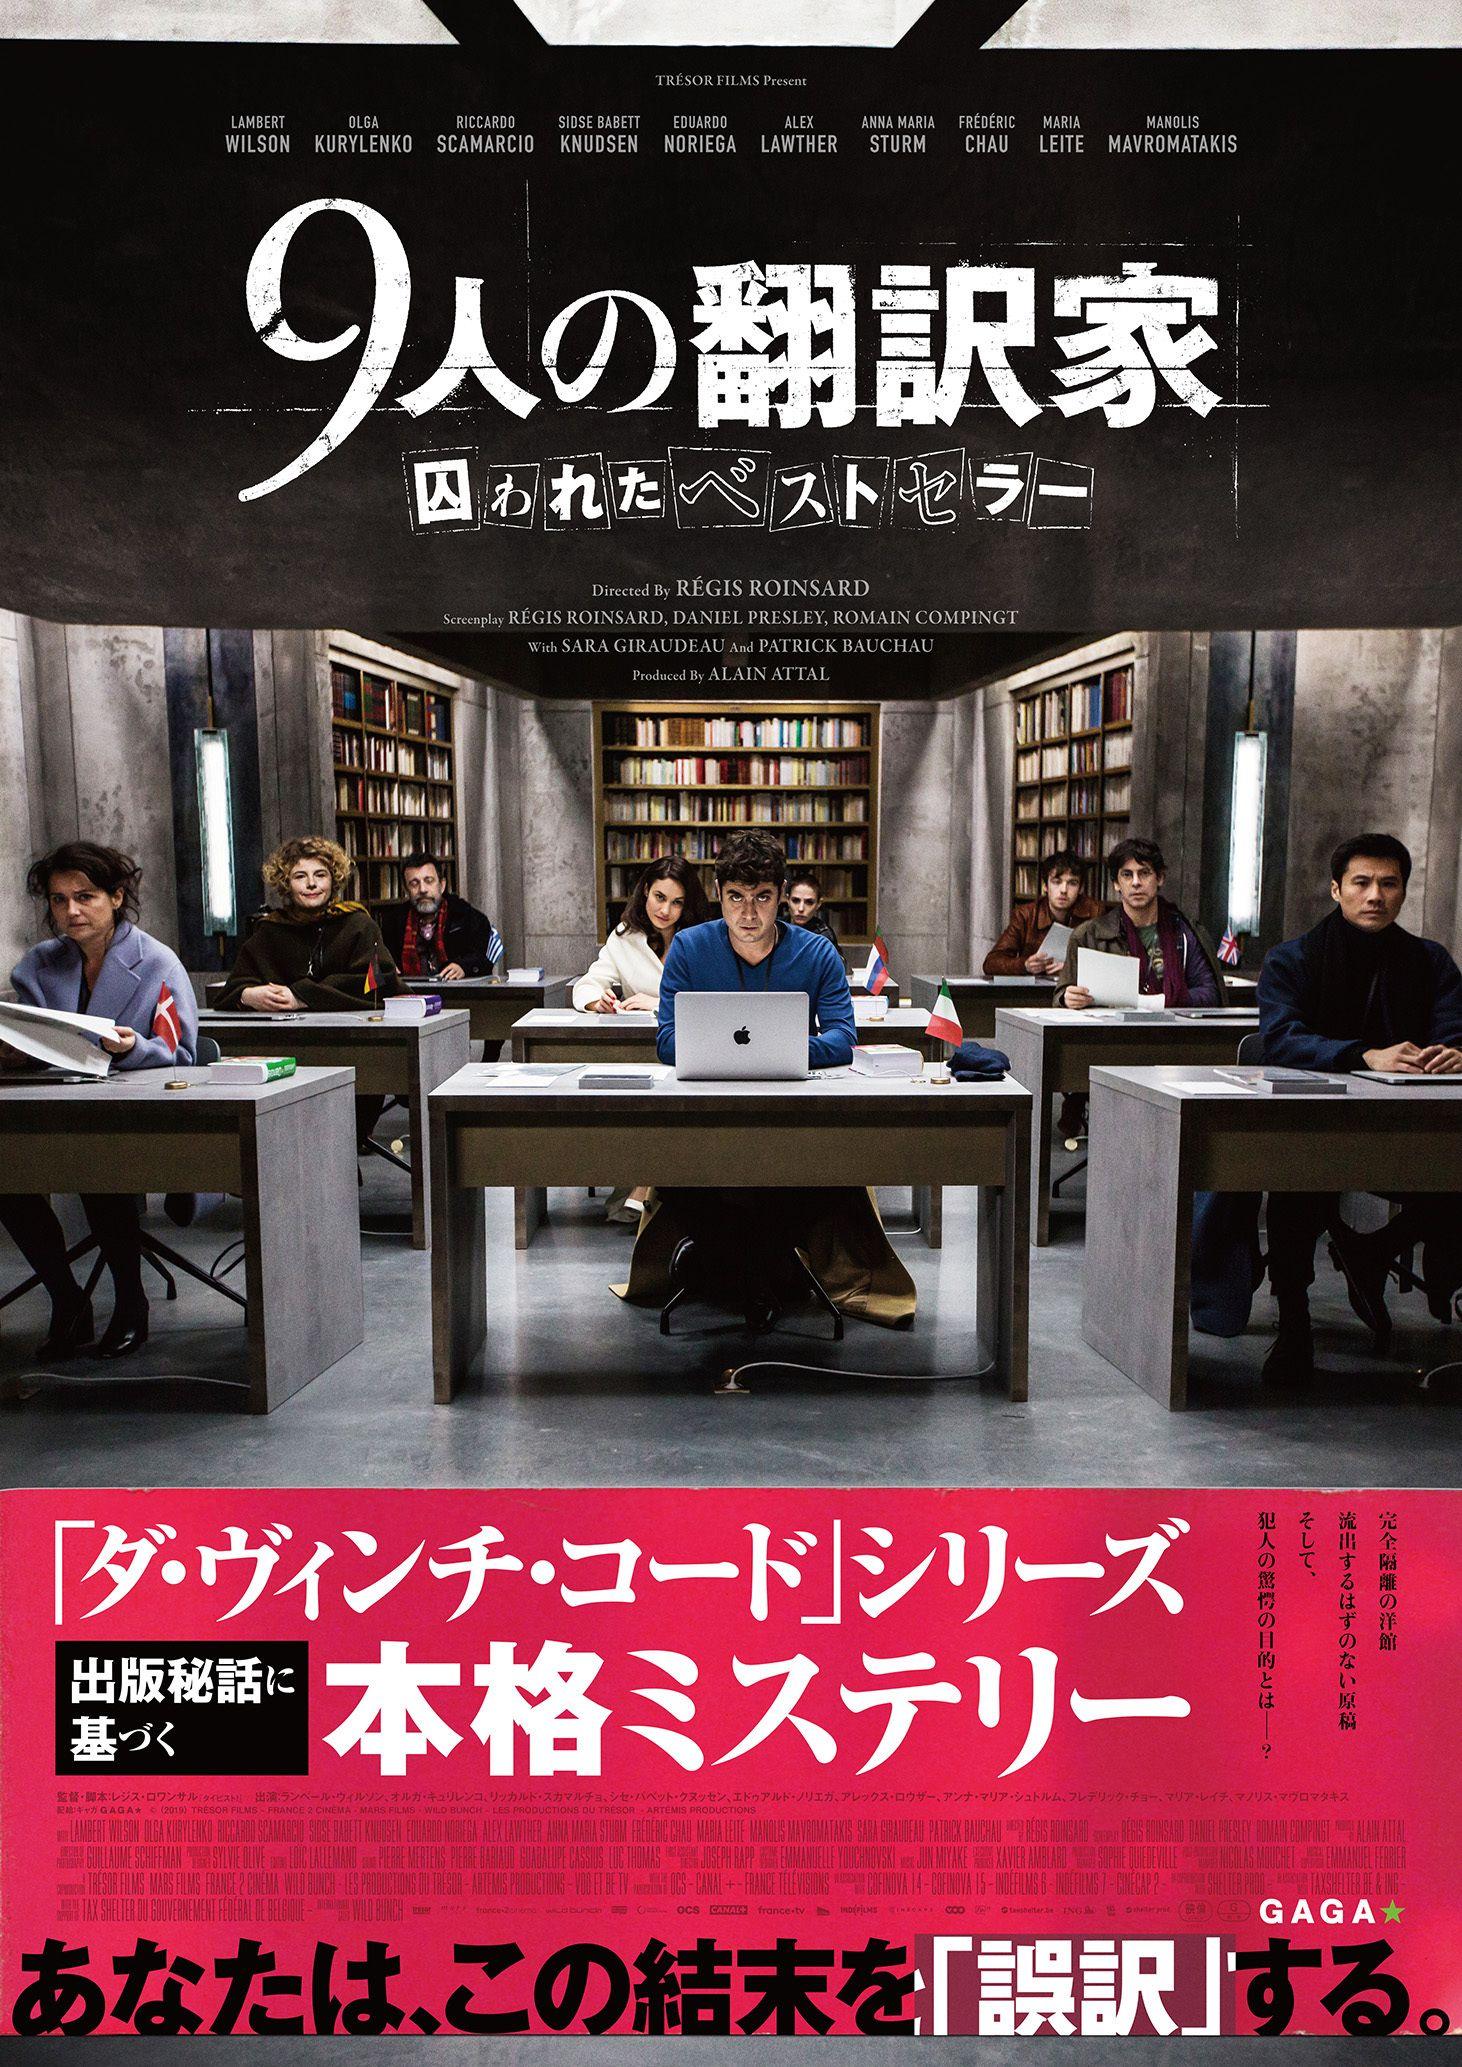 New Movie 期待の新作映画 リバイバル 特集上映 おしゃれまとめの人気アイデア Pinterest Tetsuya Yoshida 2020 ベストセラー 映画 新作映画